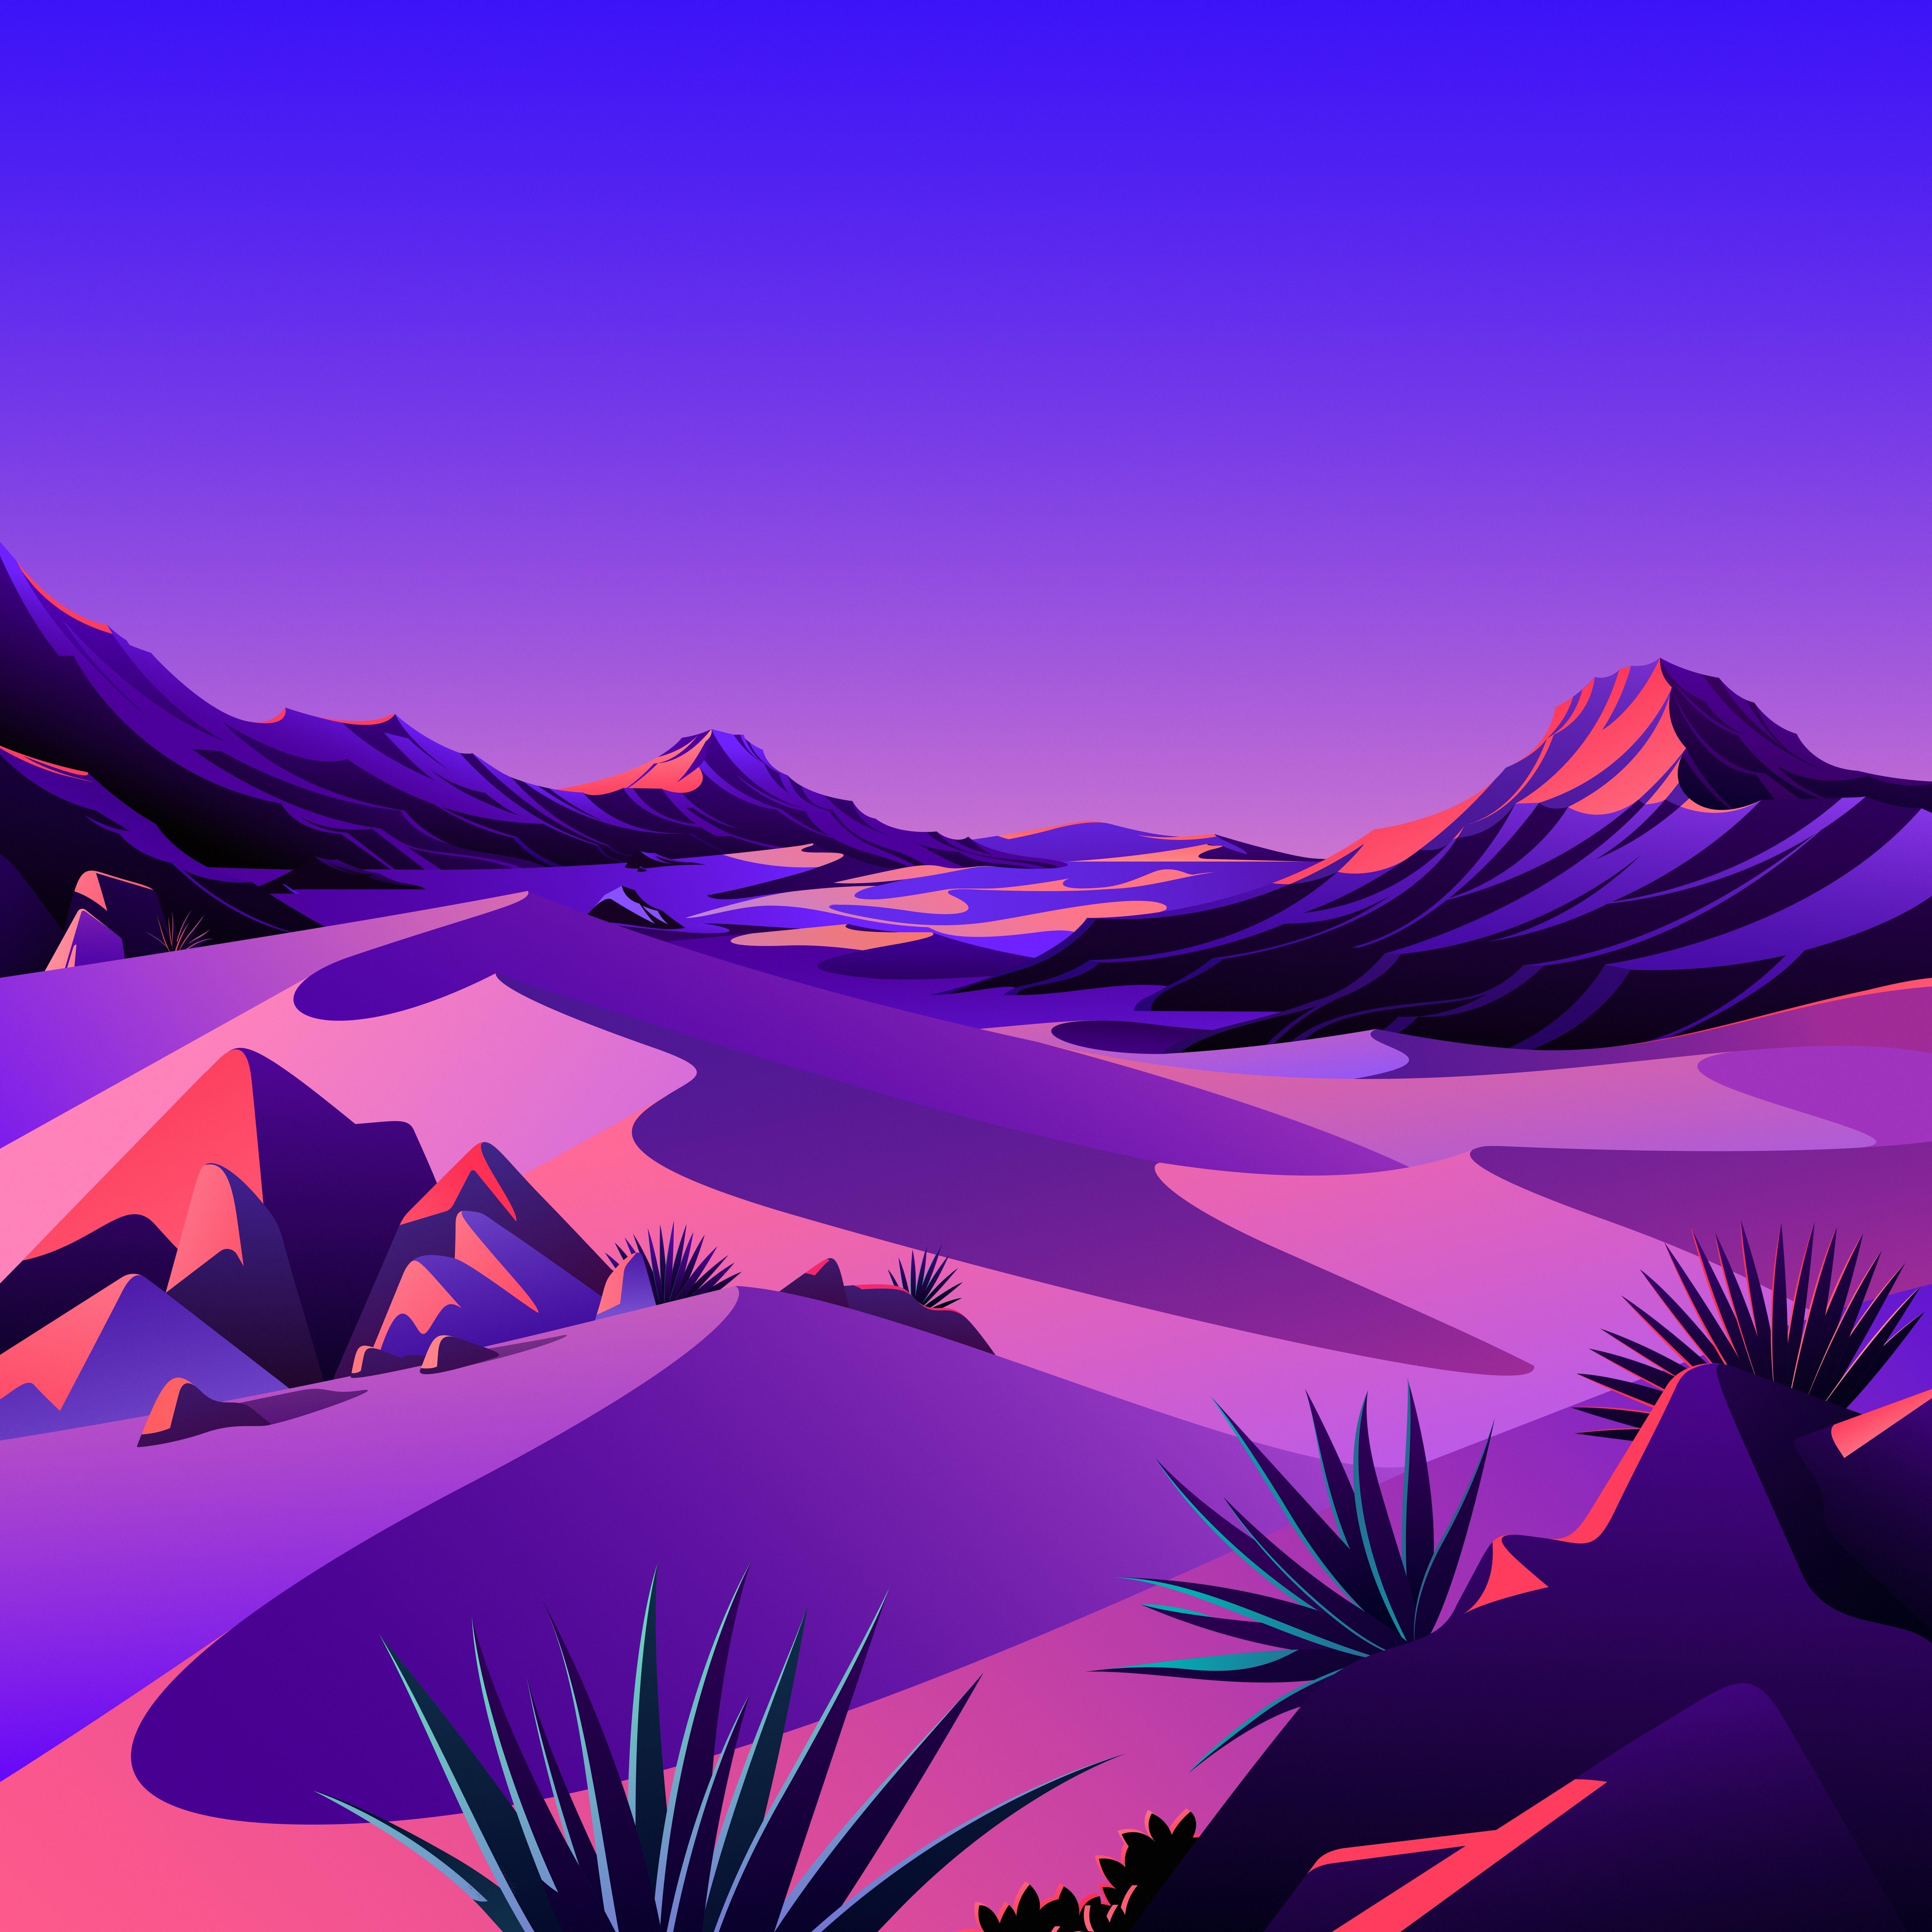 macOS Big Sur The Desert 7 dragged